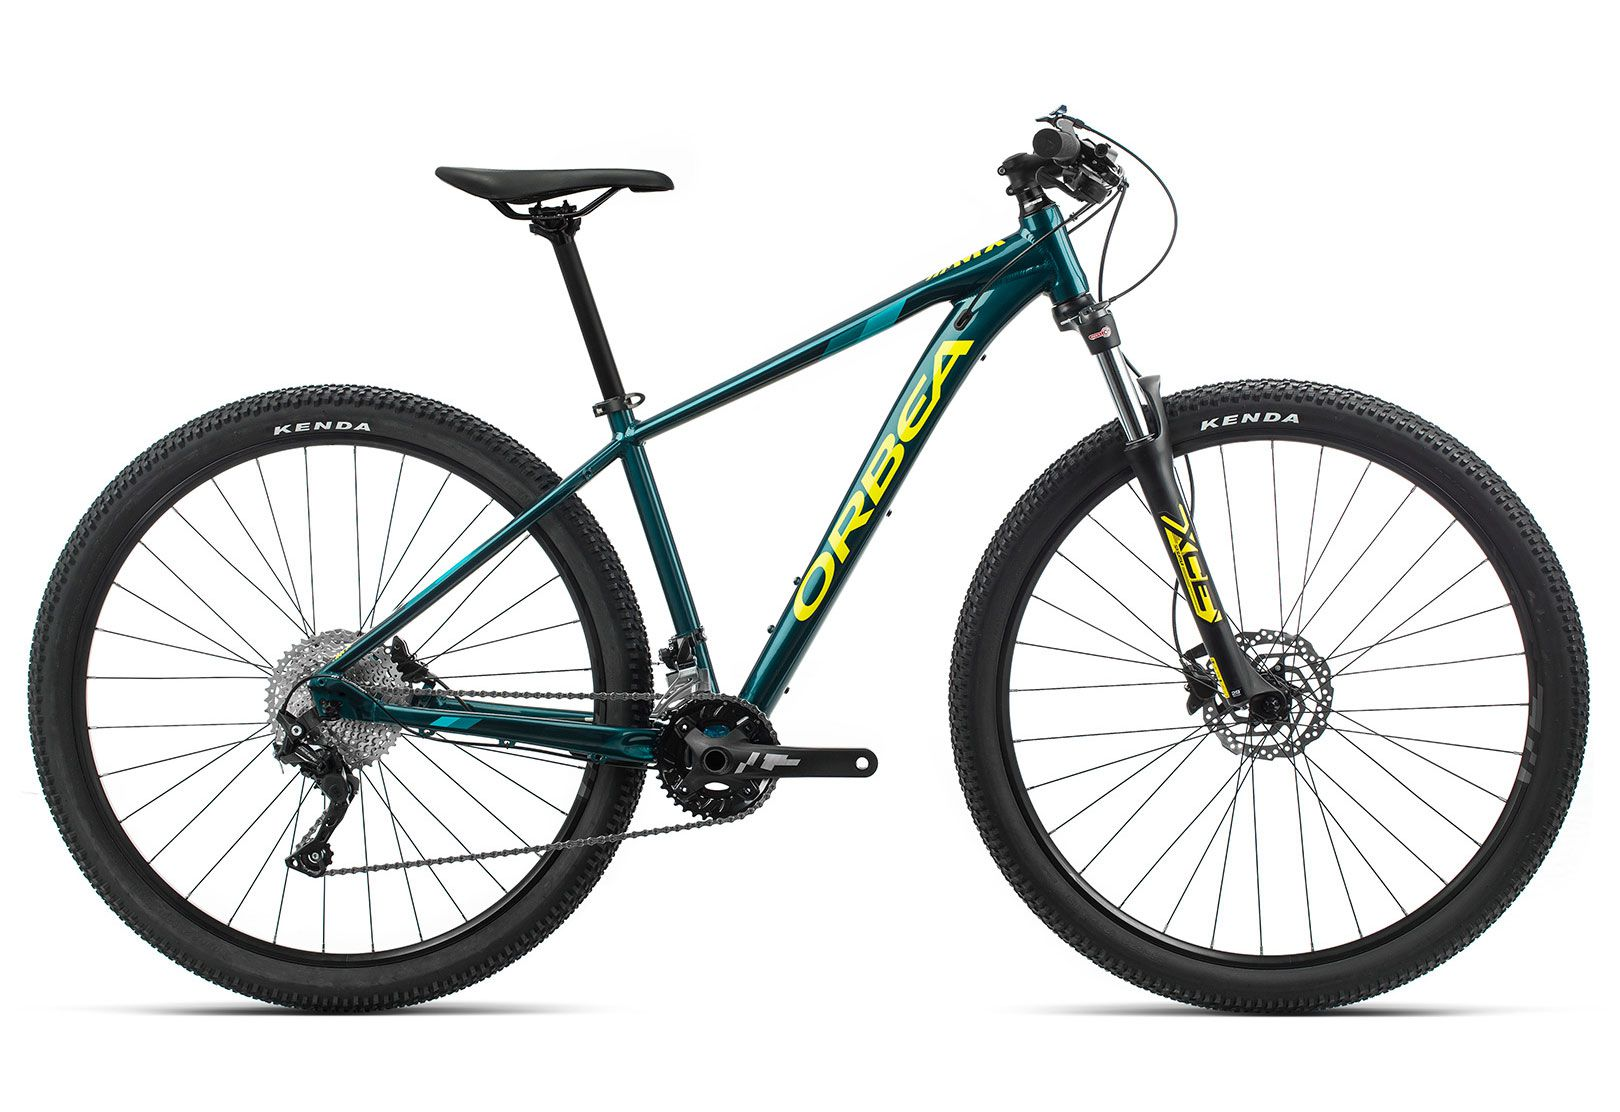 Bicicleta MTB Orbea MX 29 30 - Tam L - Oceano/Amarelo 2020